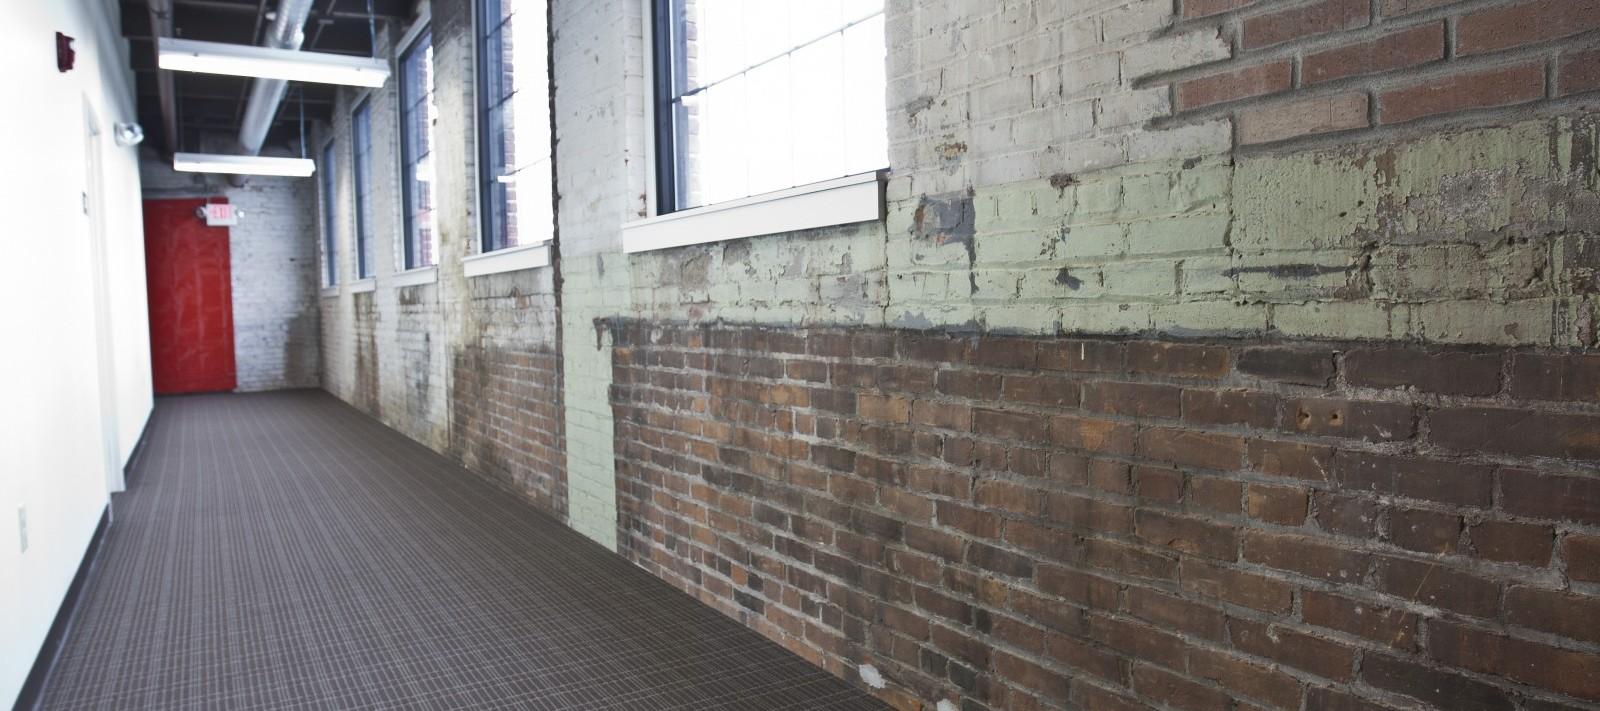 Jackson Square apartments hallway